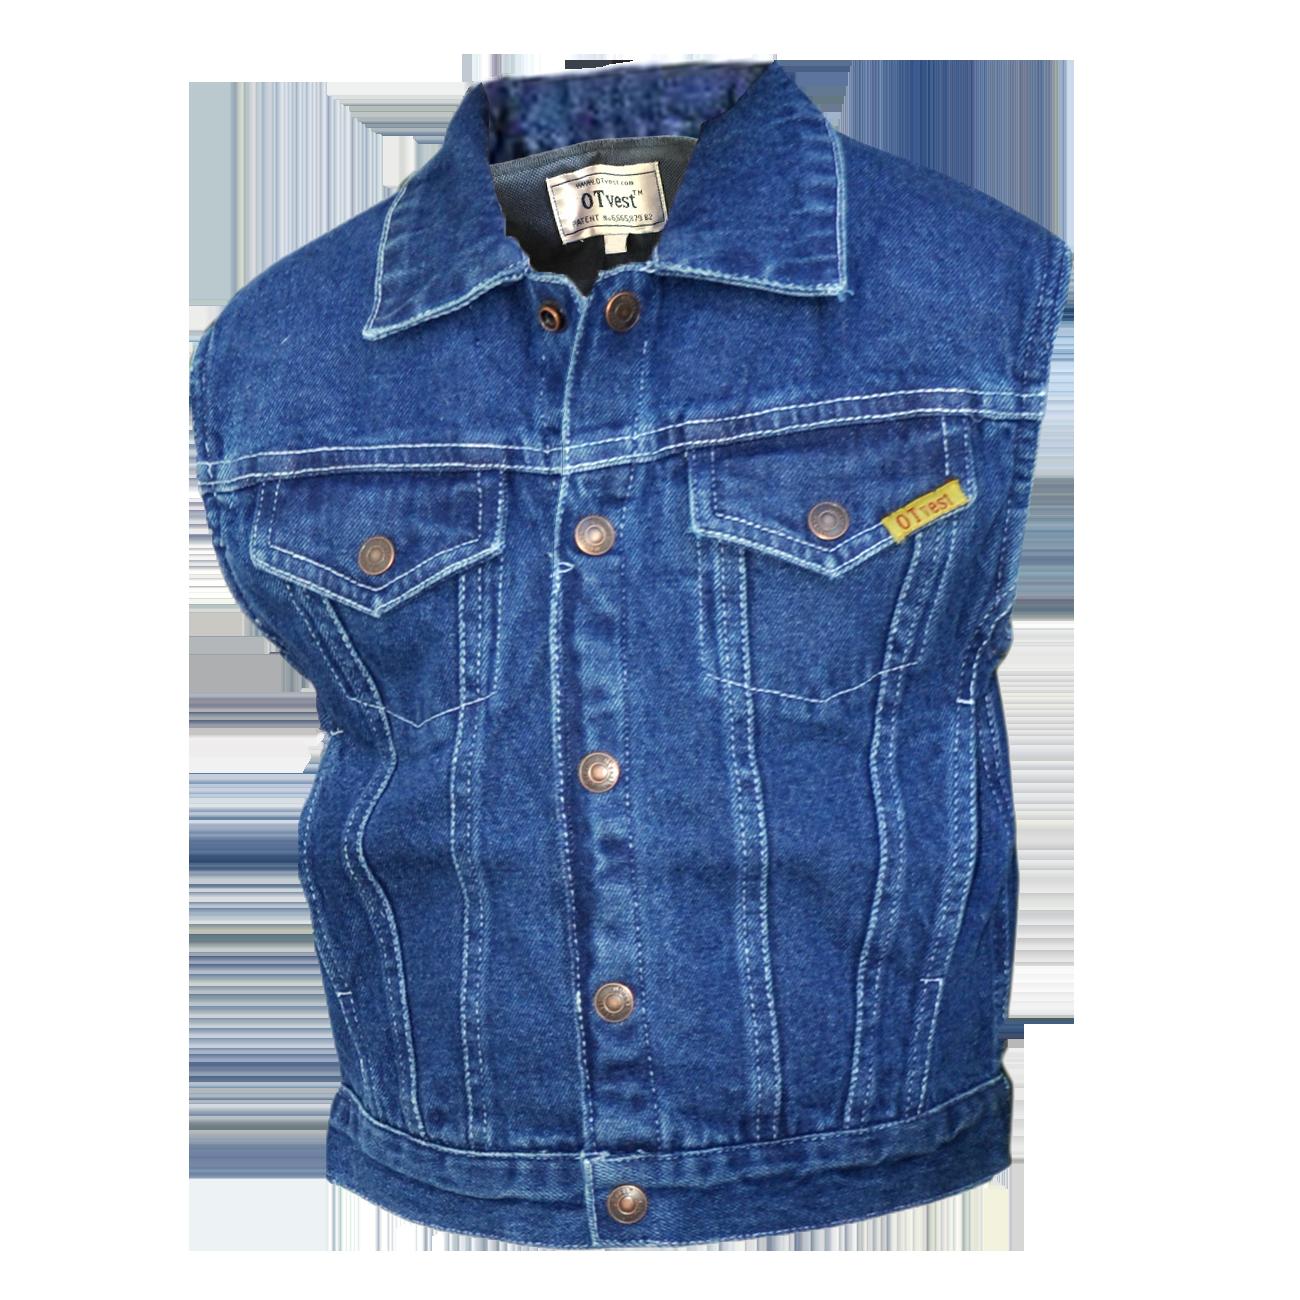 Jacket clipart jeans jacket. Order the otvest